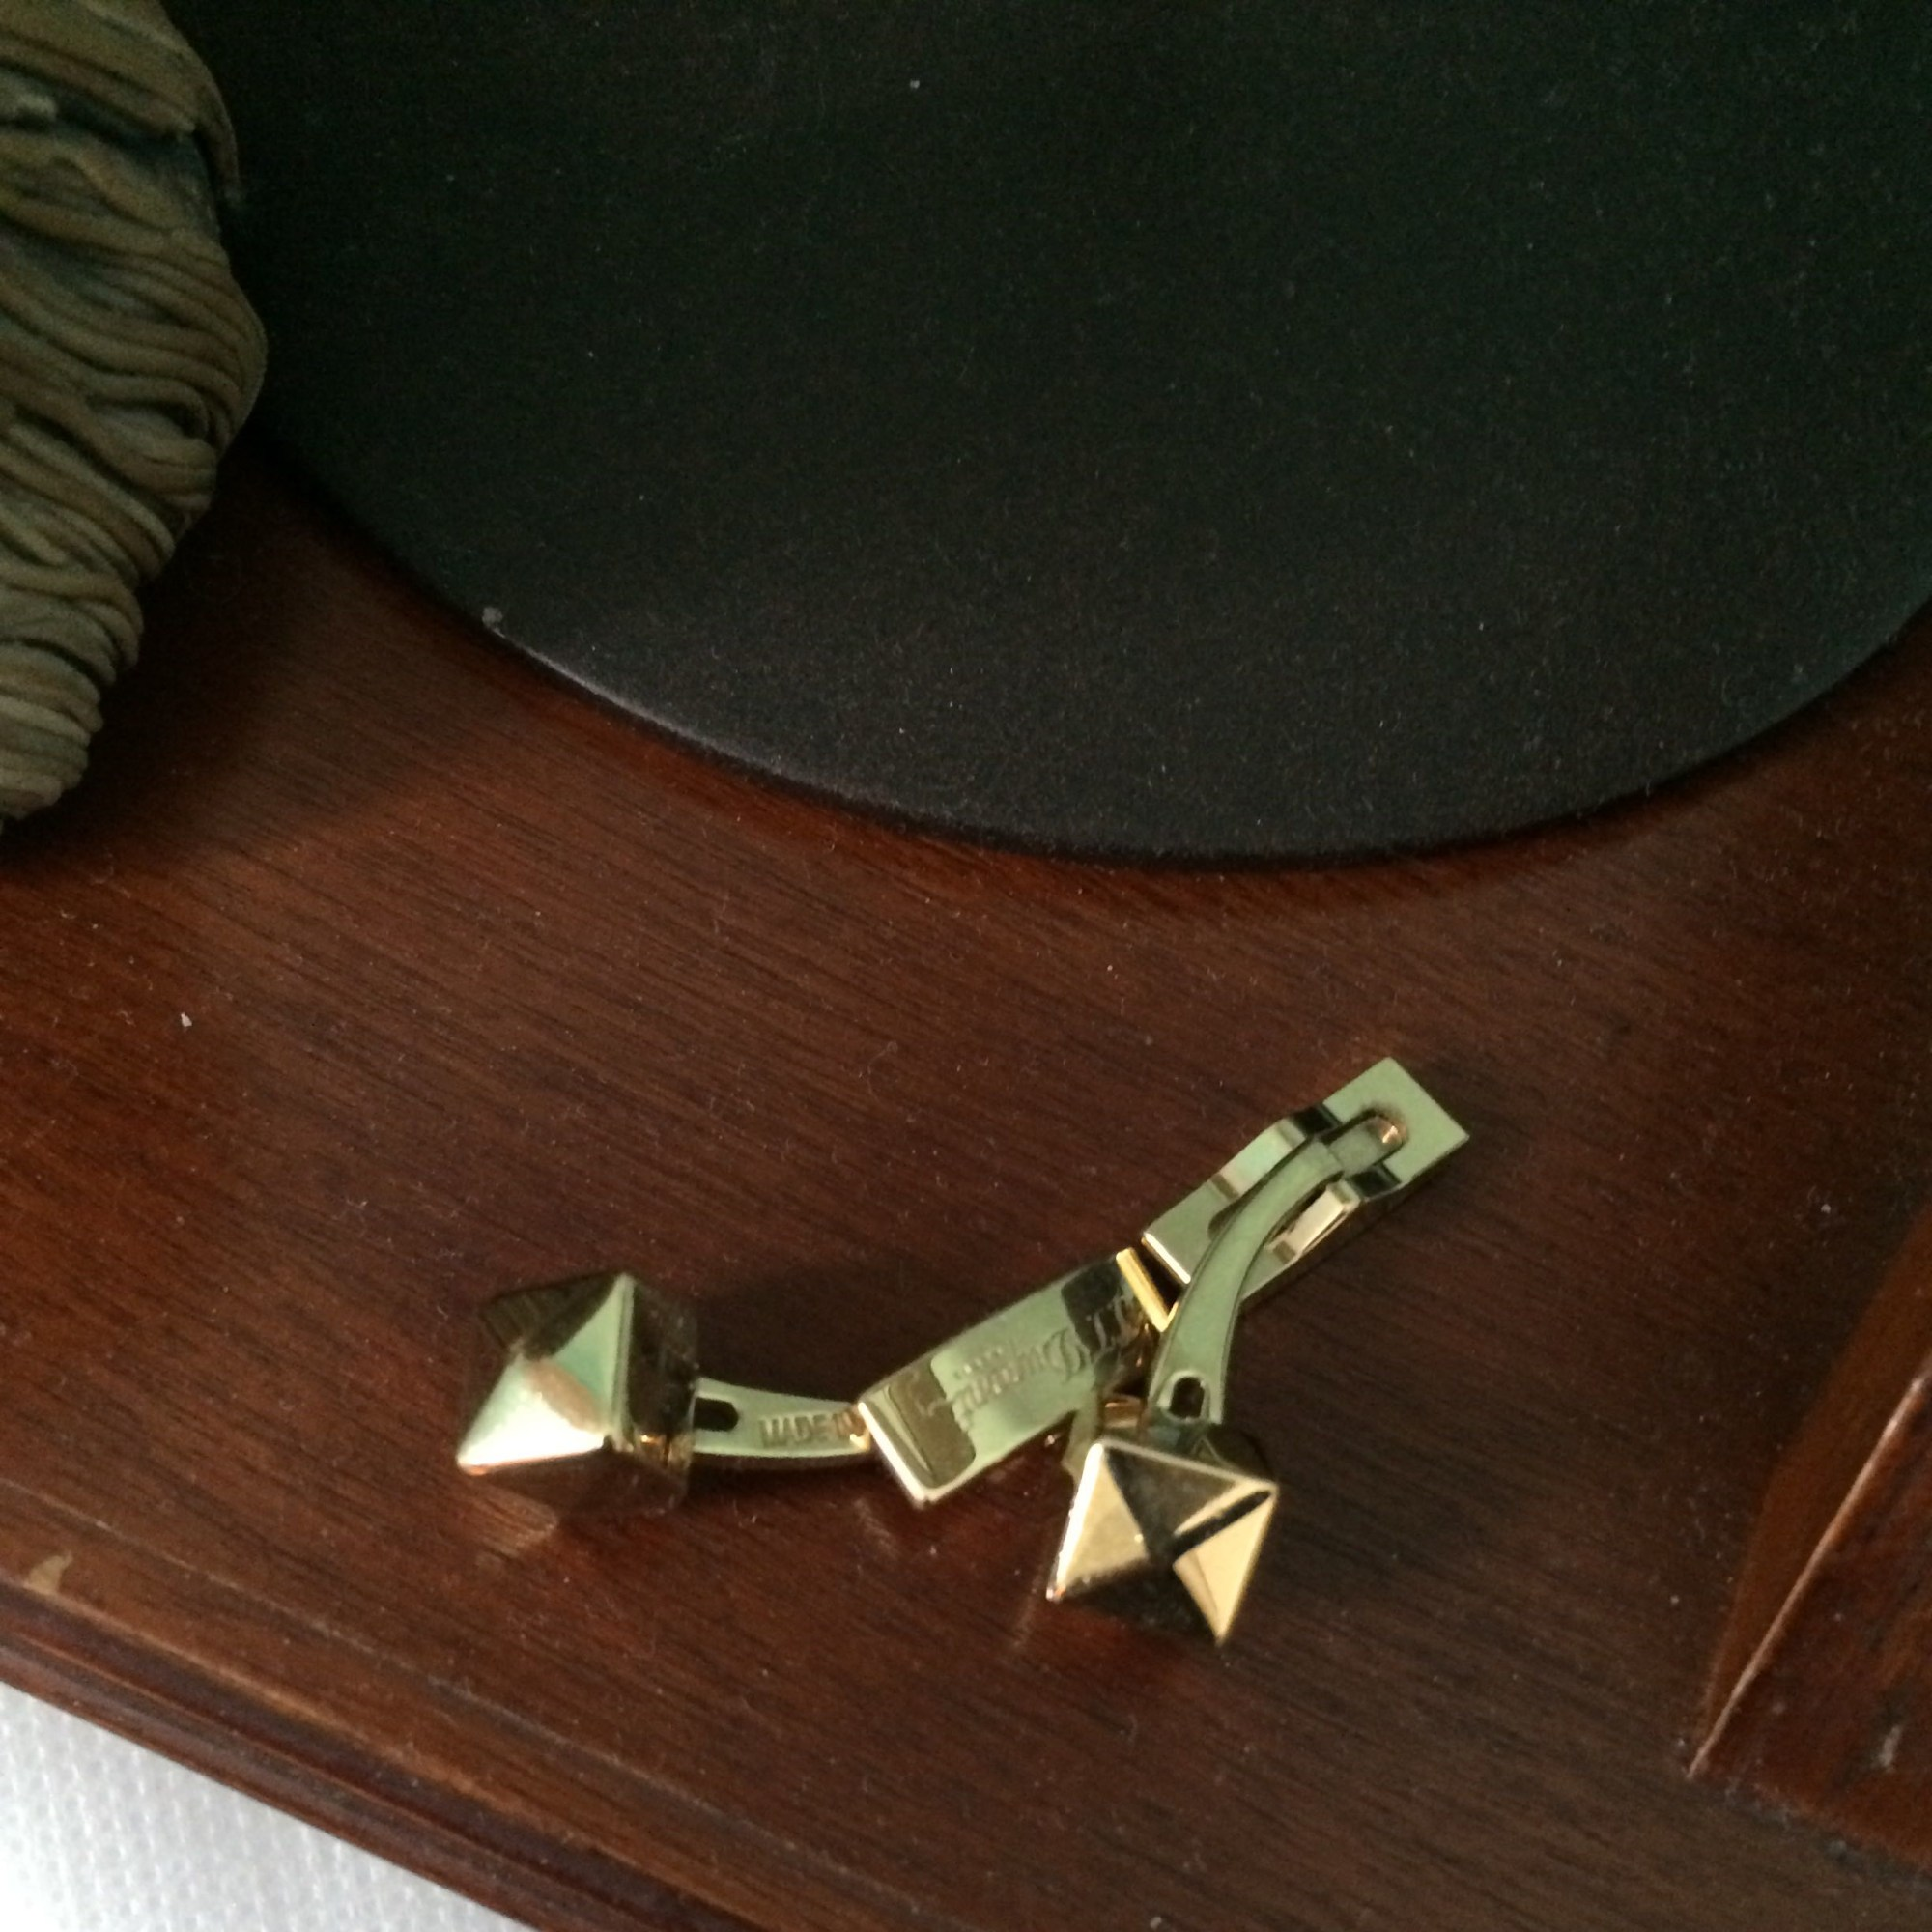 Gemelli S.T DUPONT Dorato, bronzo, rame